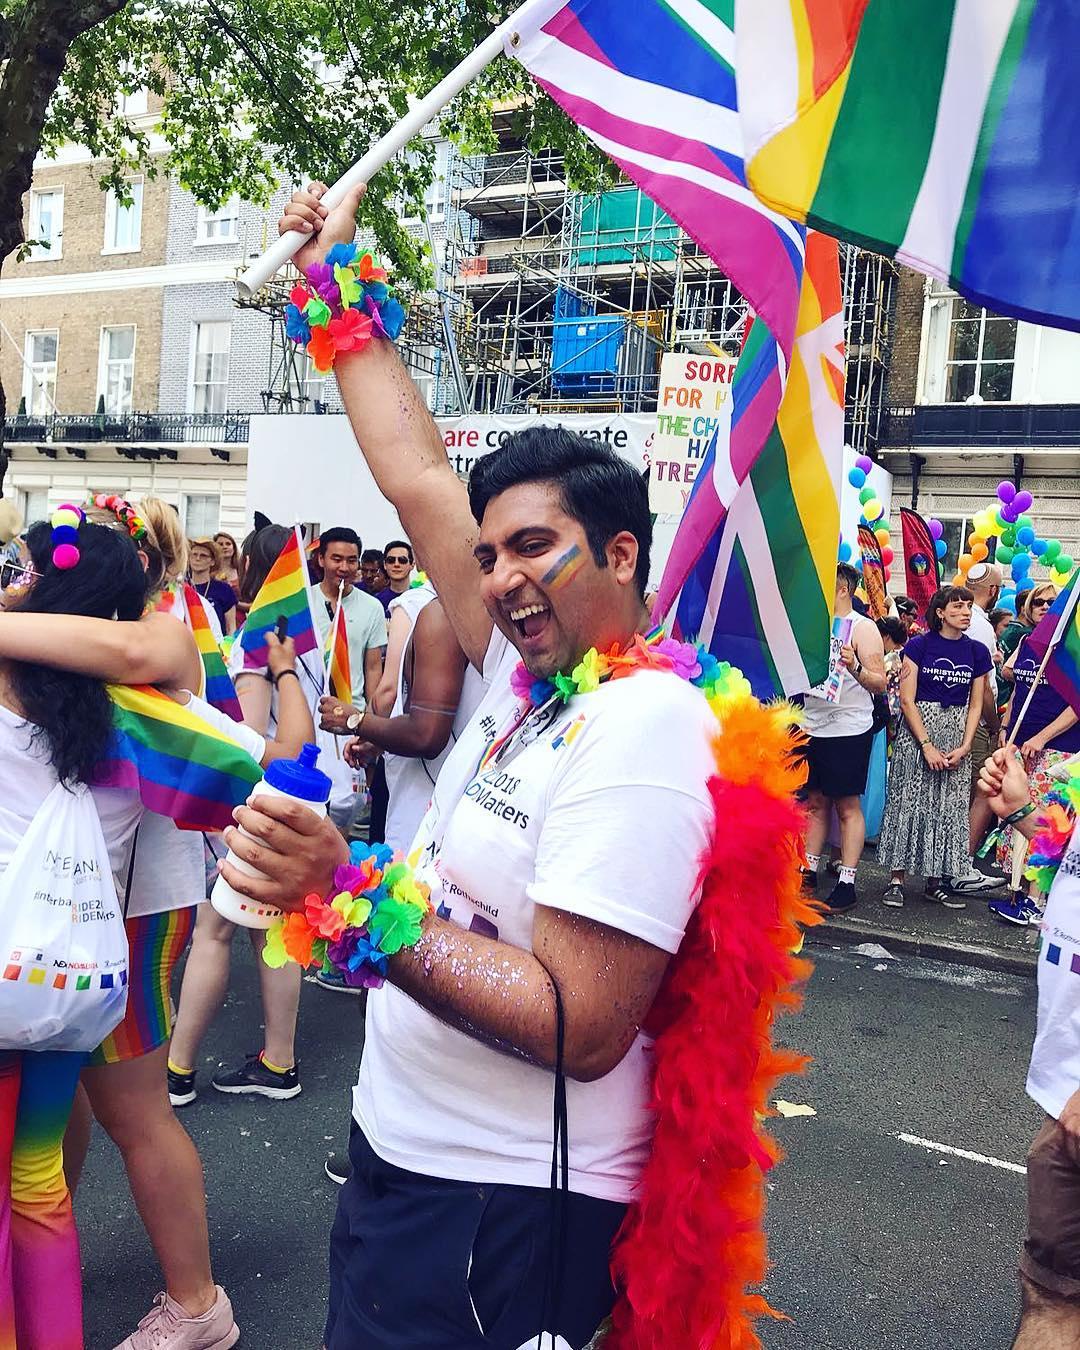 Pride london parade 2018 flag salmansamiali